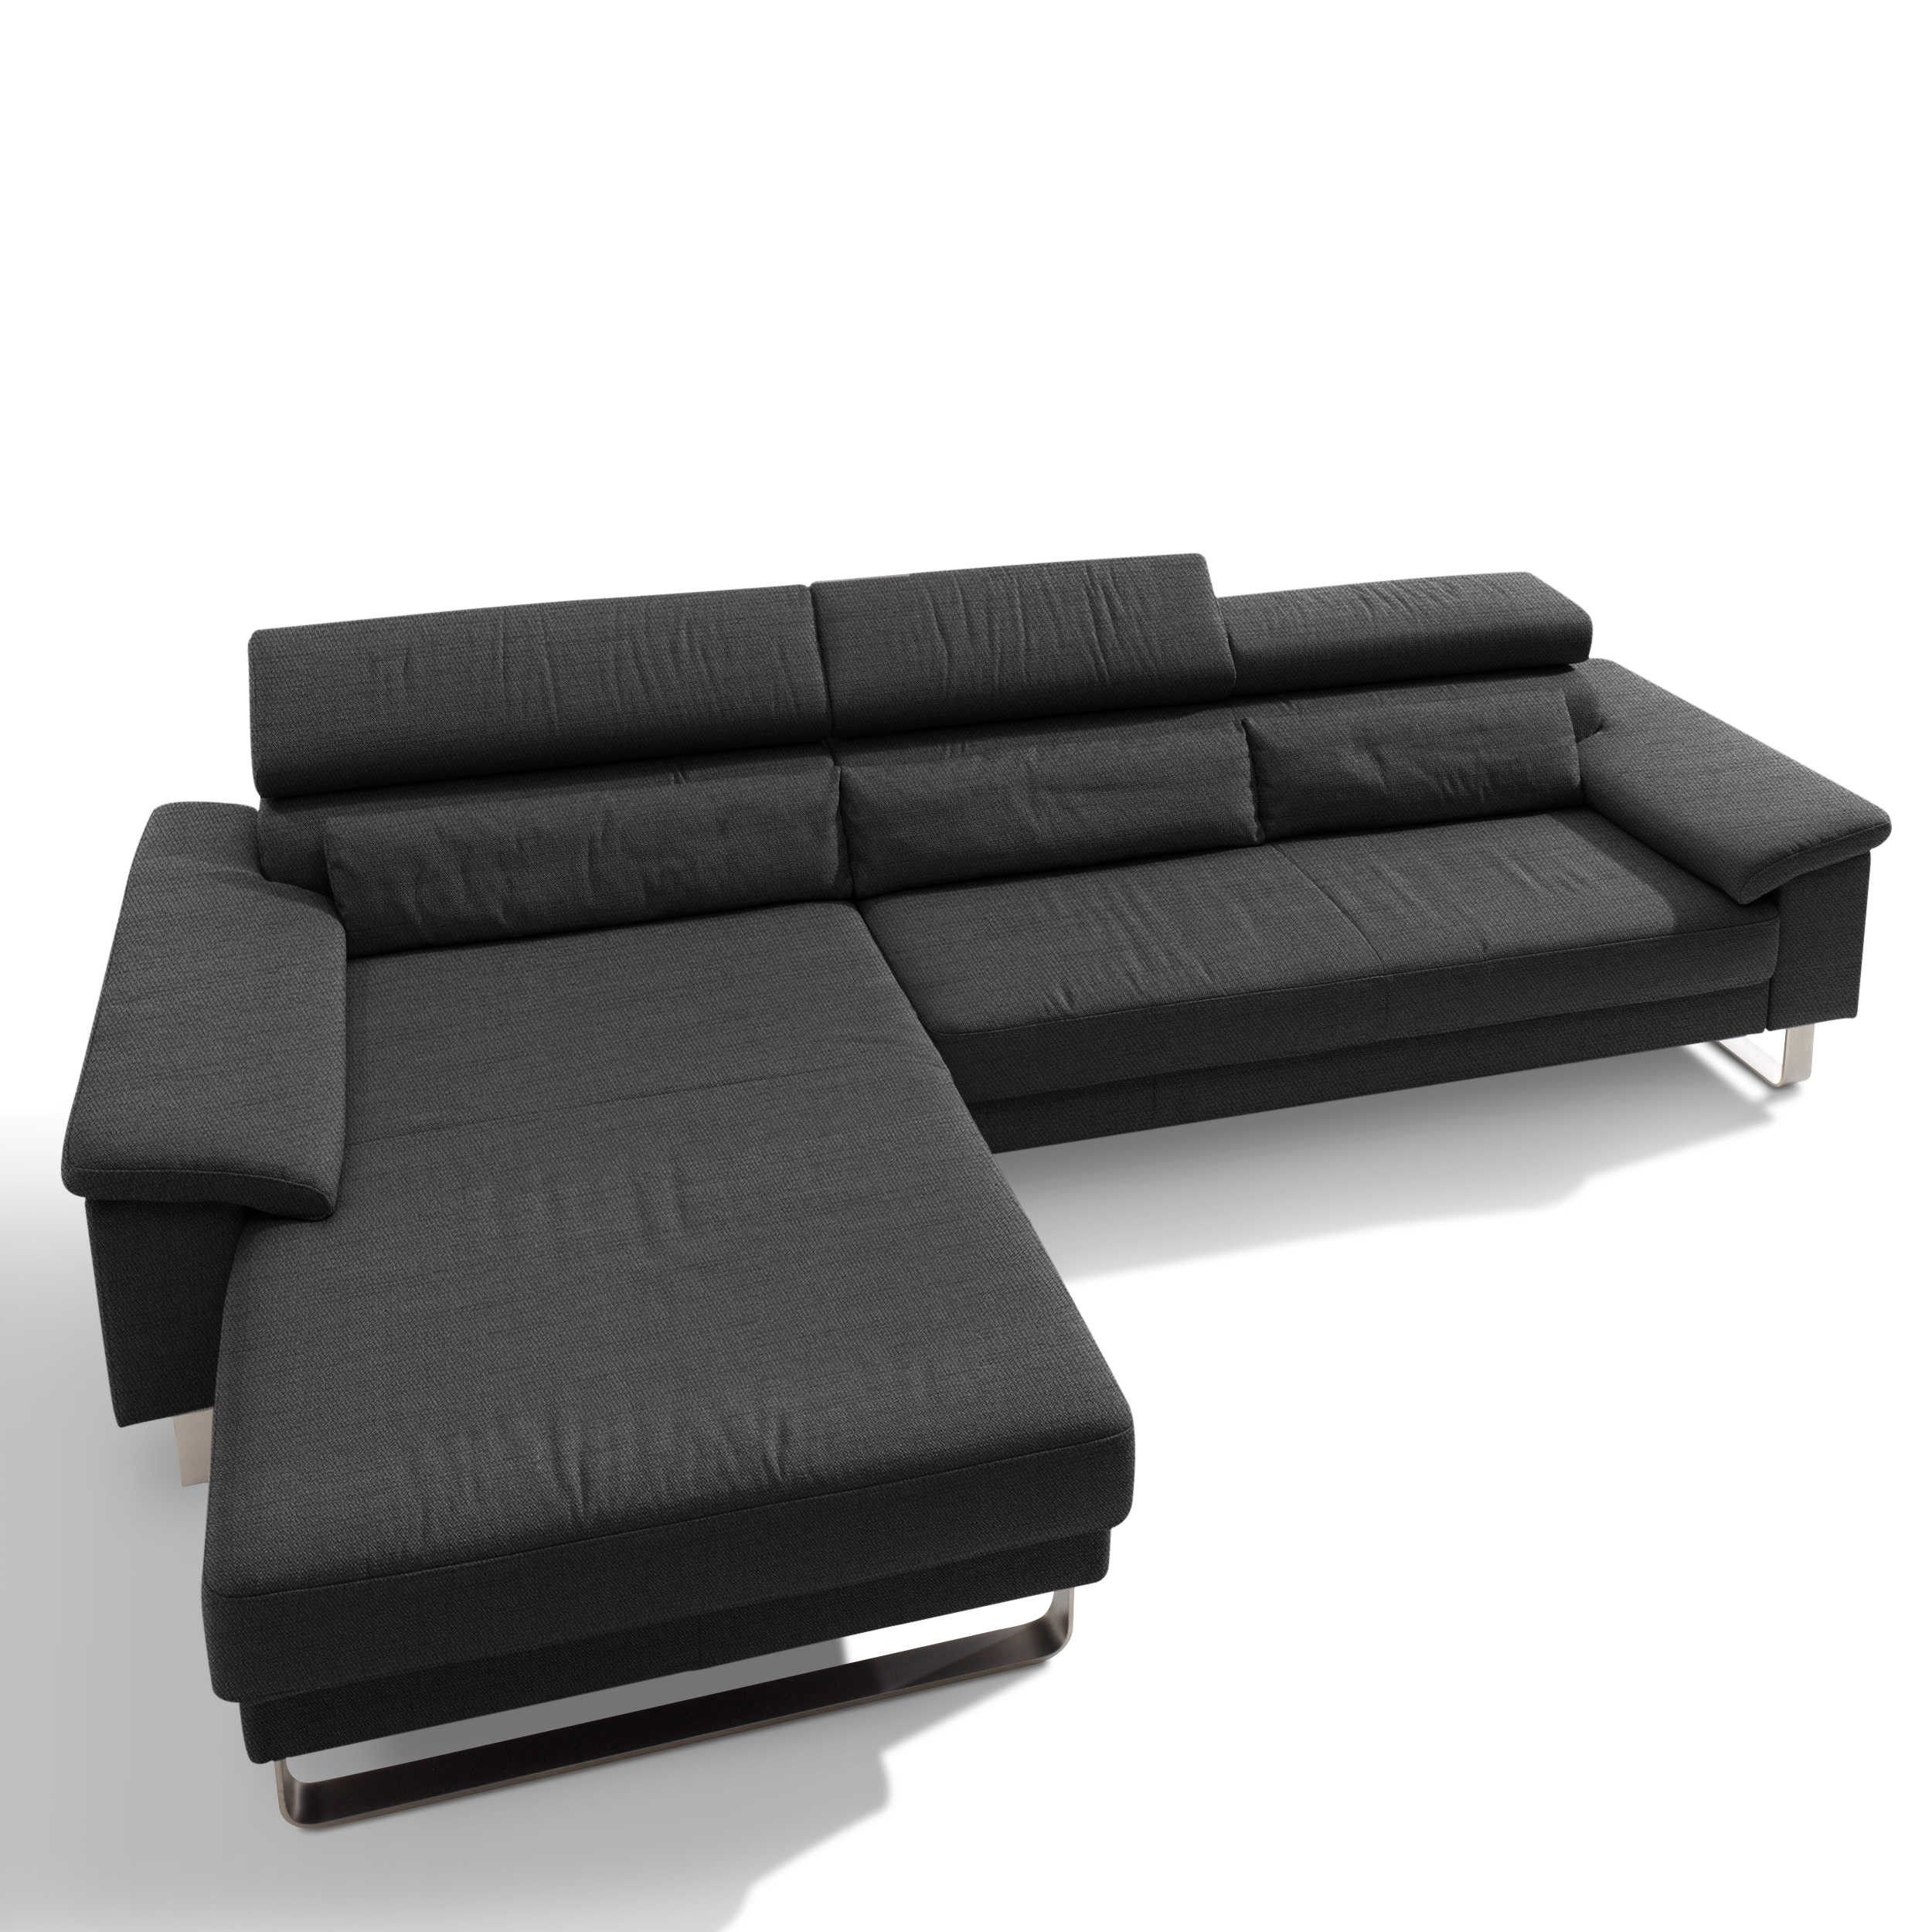 Segmuller Werkstatten Sofa Mercury Stoff Anthrazit Grau Stoff